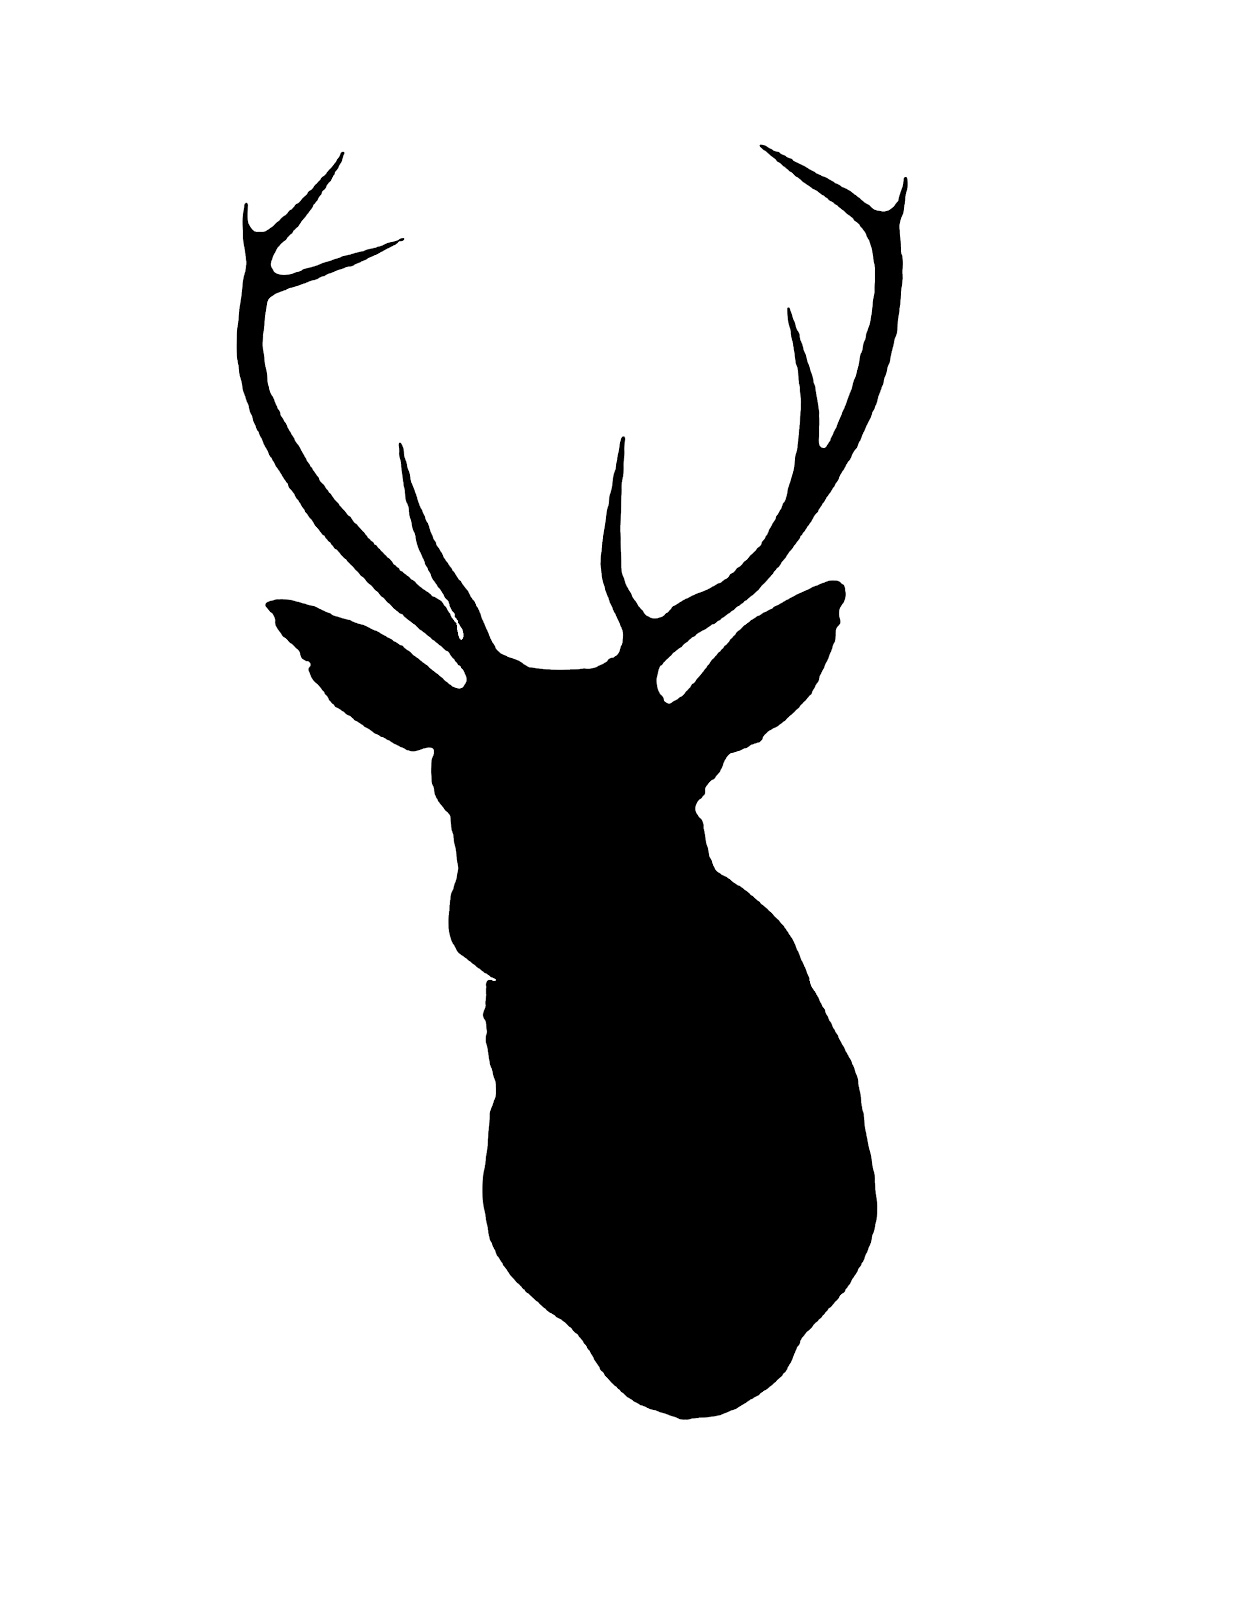 1236x1600 Qtbxyak6c On Deer Silhouette Free Printable